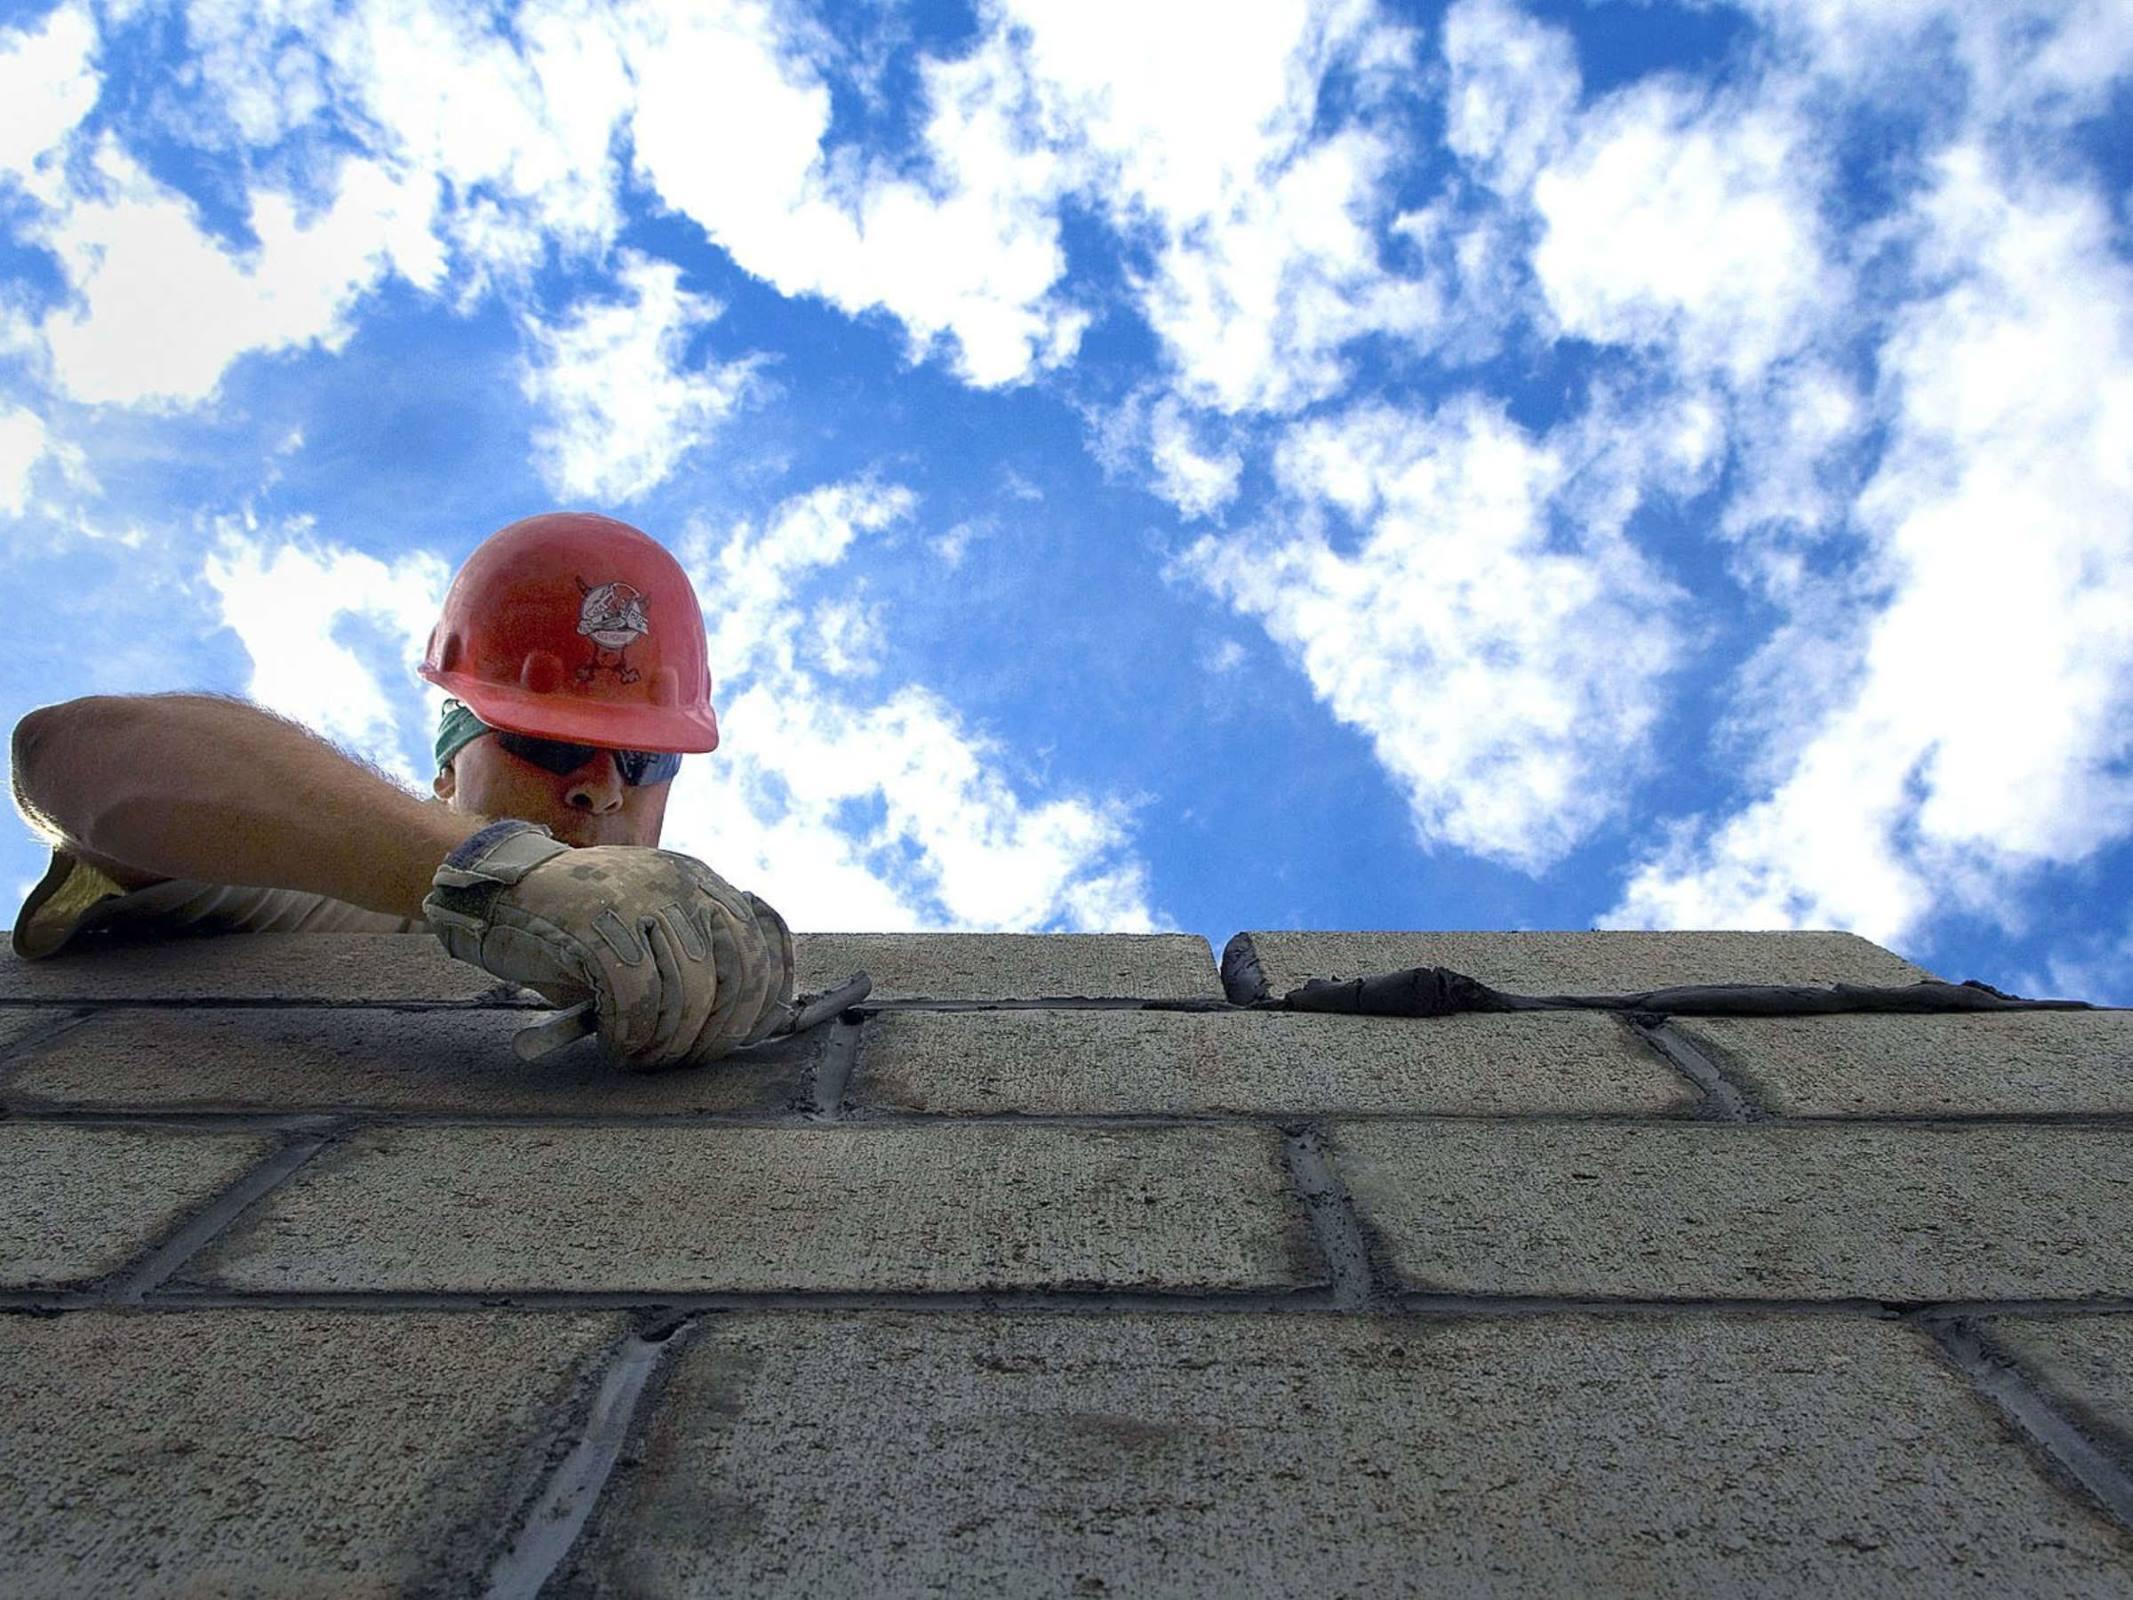 Worker roofer shingles